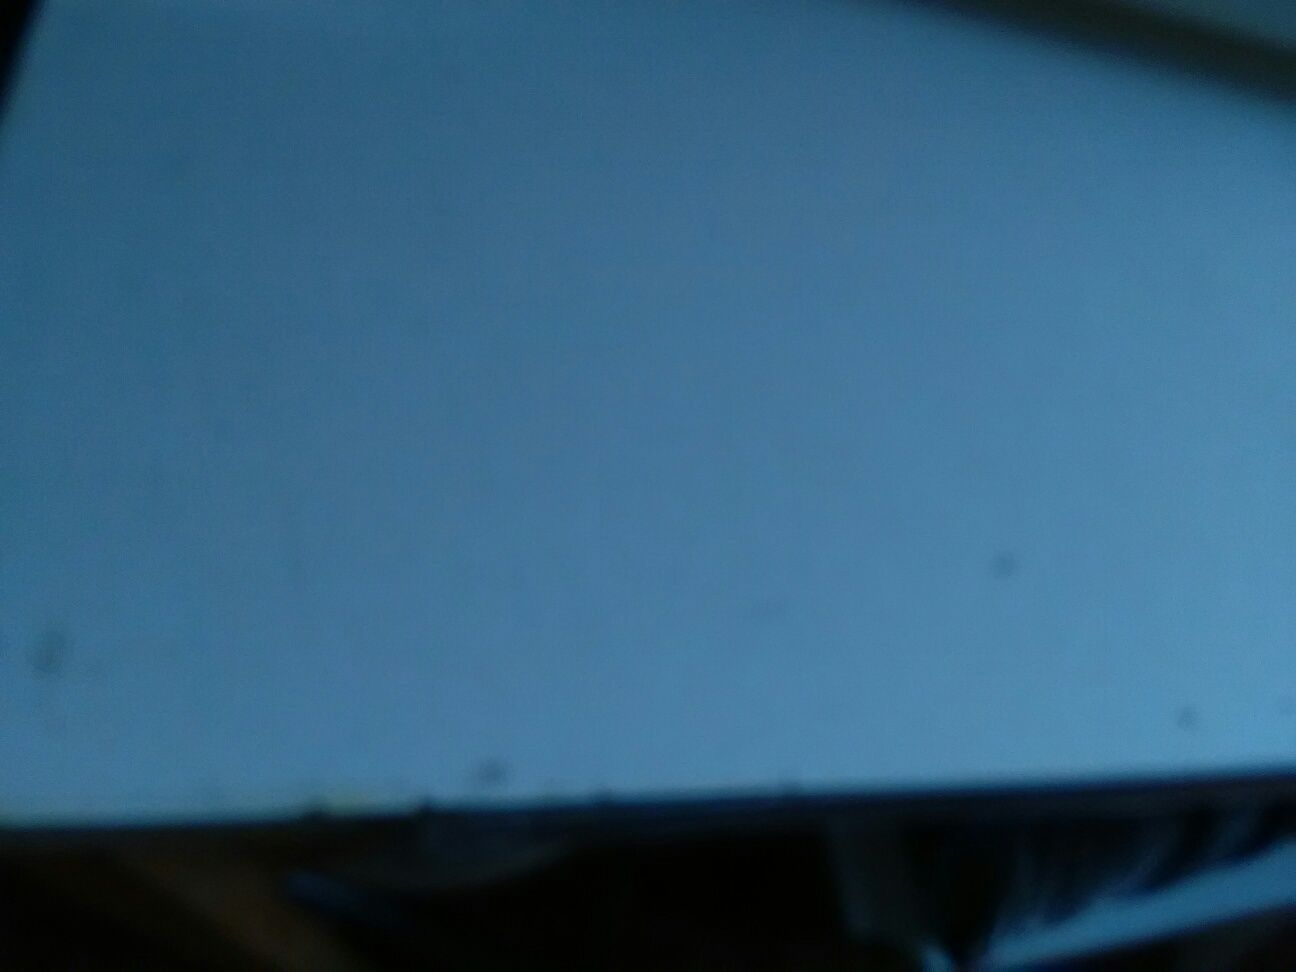 Vand masa bucatarie lungime 103cm,latime 60cm,inaltime 77 cm